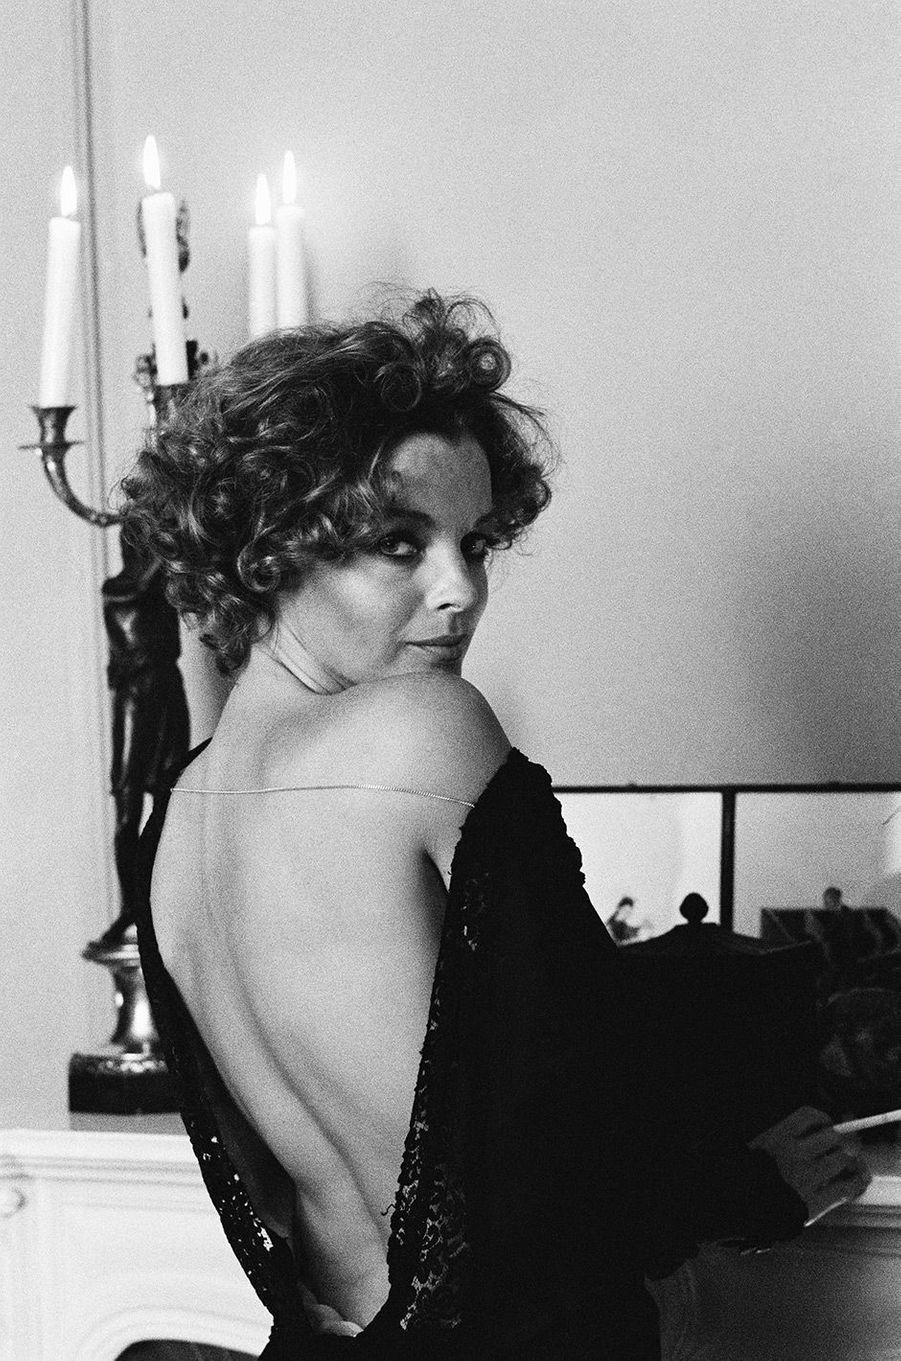 Sexy Match : Romy Schneider, la princesse de beauté